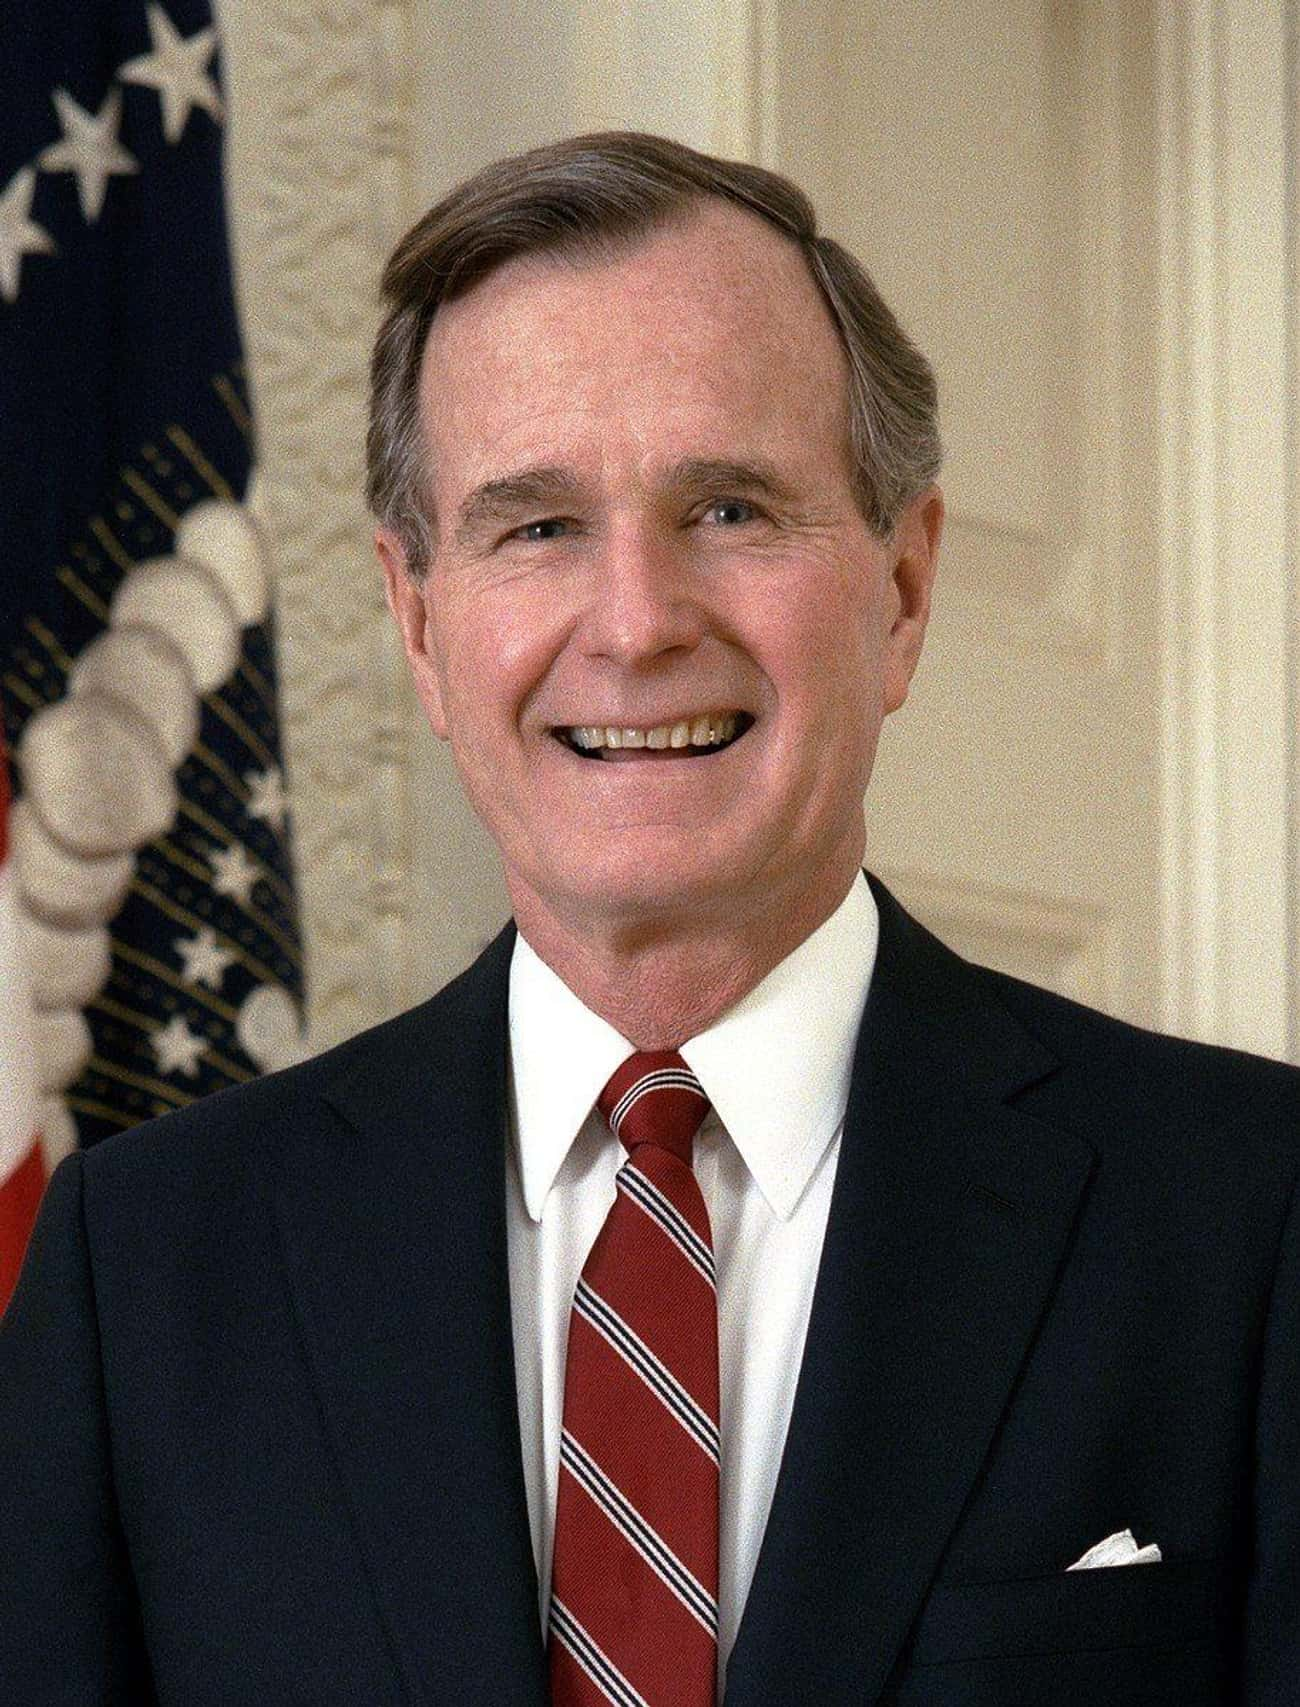 George H. W. Bush - Oil Rig Painter